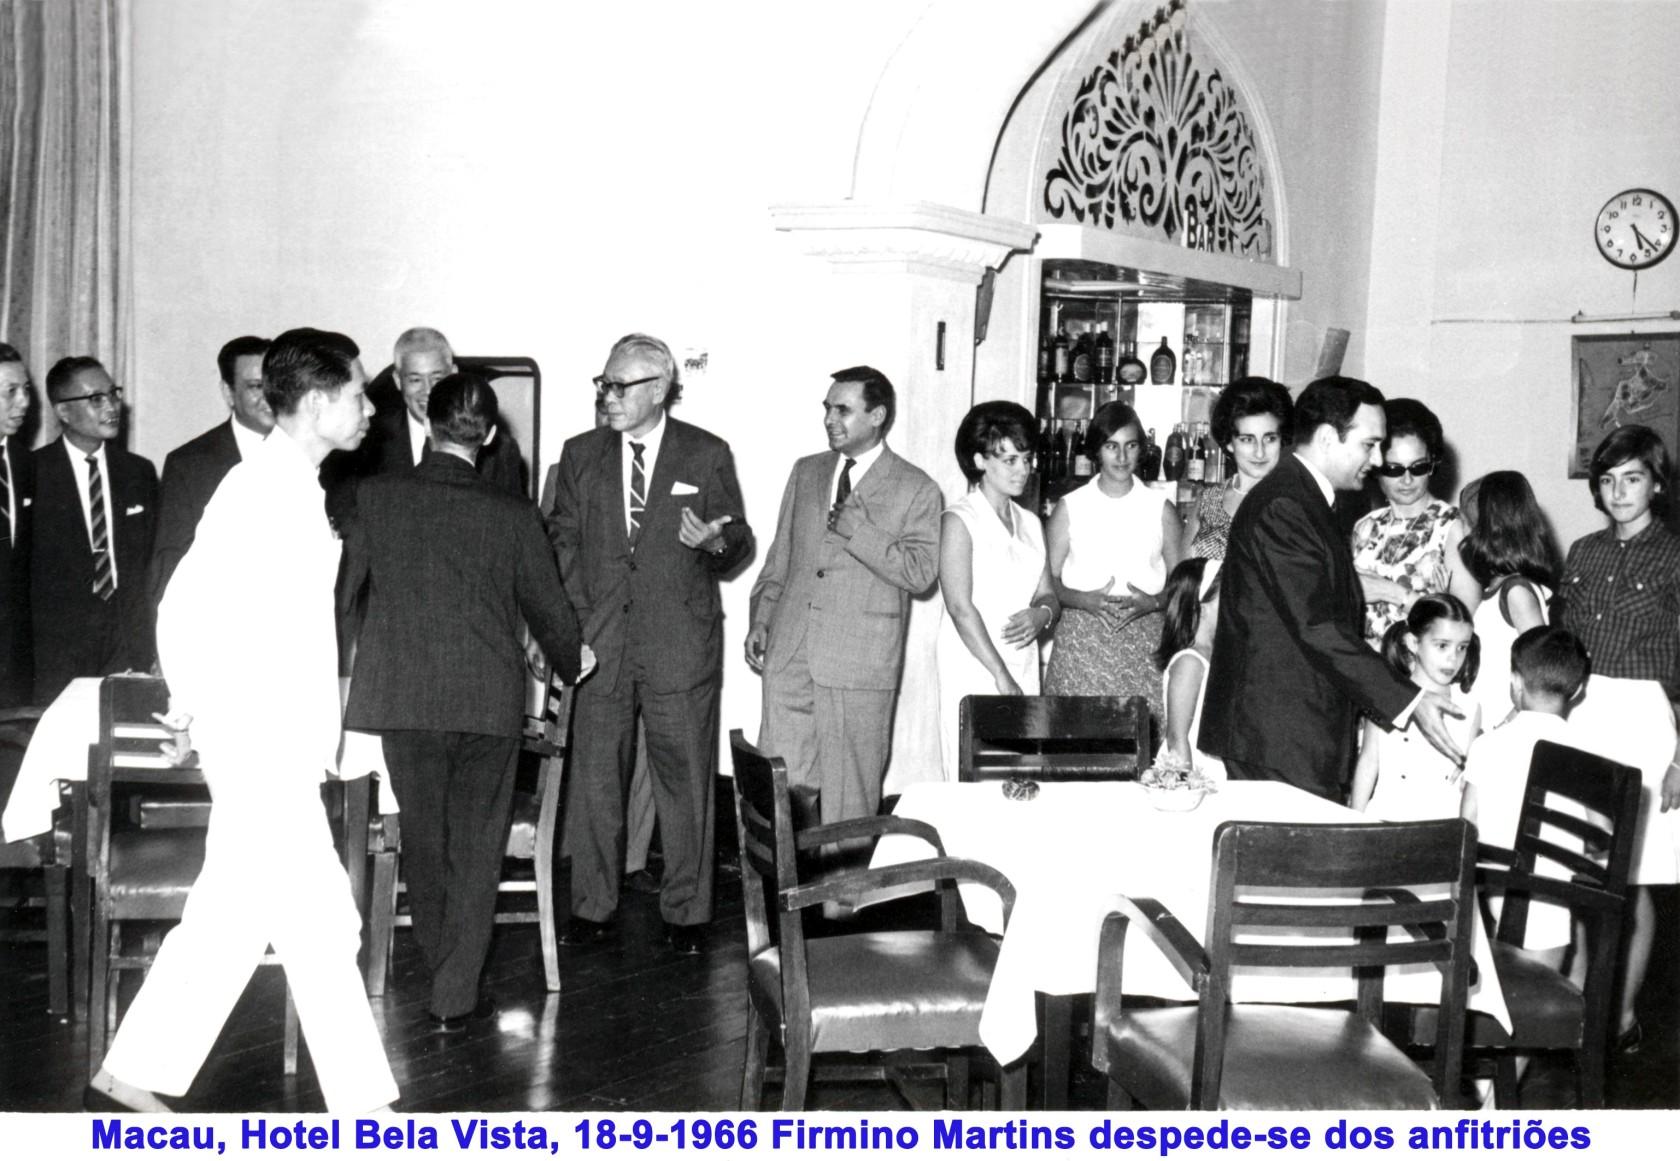 009 66-09-18 Hotel Bela Vista, Firmino despede-se